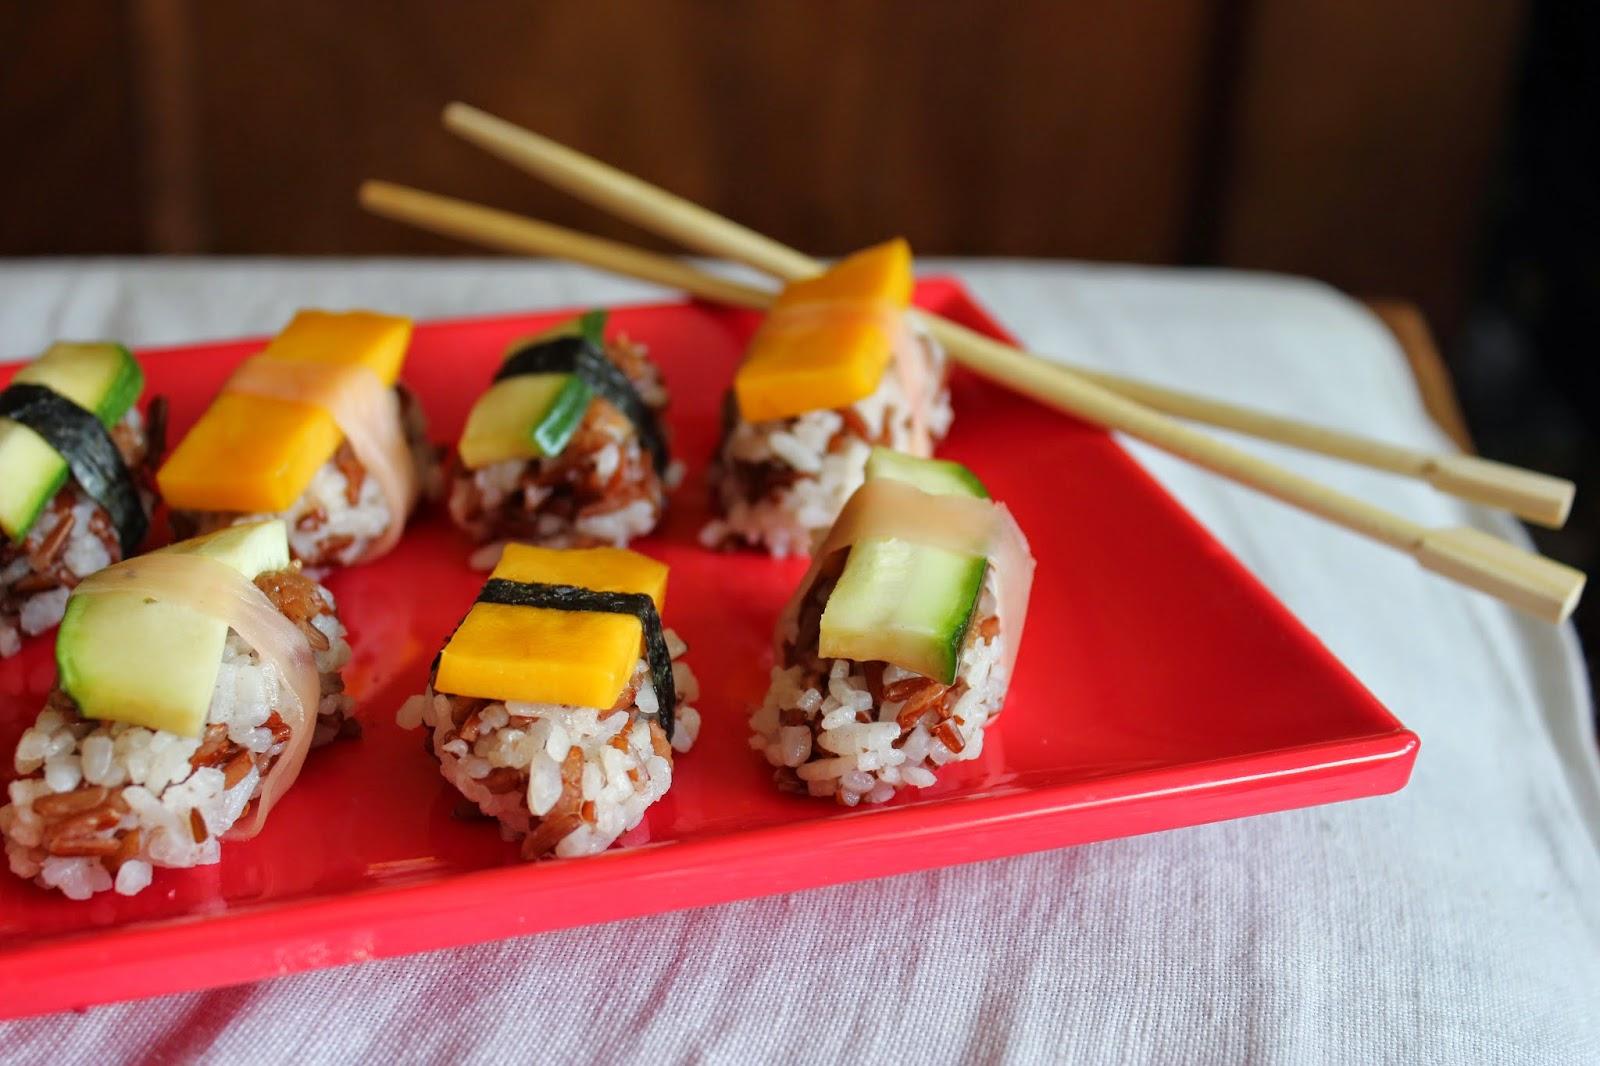 https://cuillereetsaladier.blogspot.com/2014/09/duo-de-nigiri-sushi-bicolores-et.html